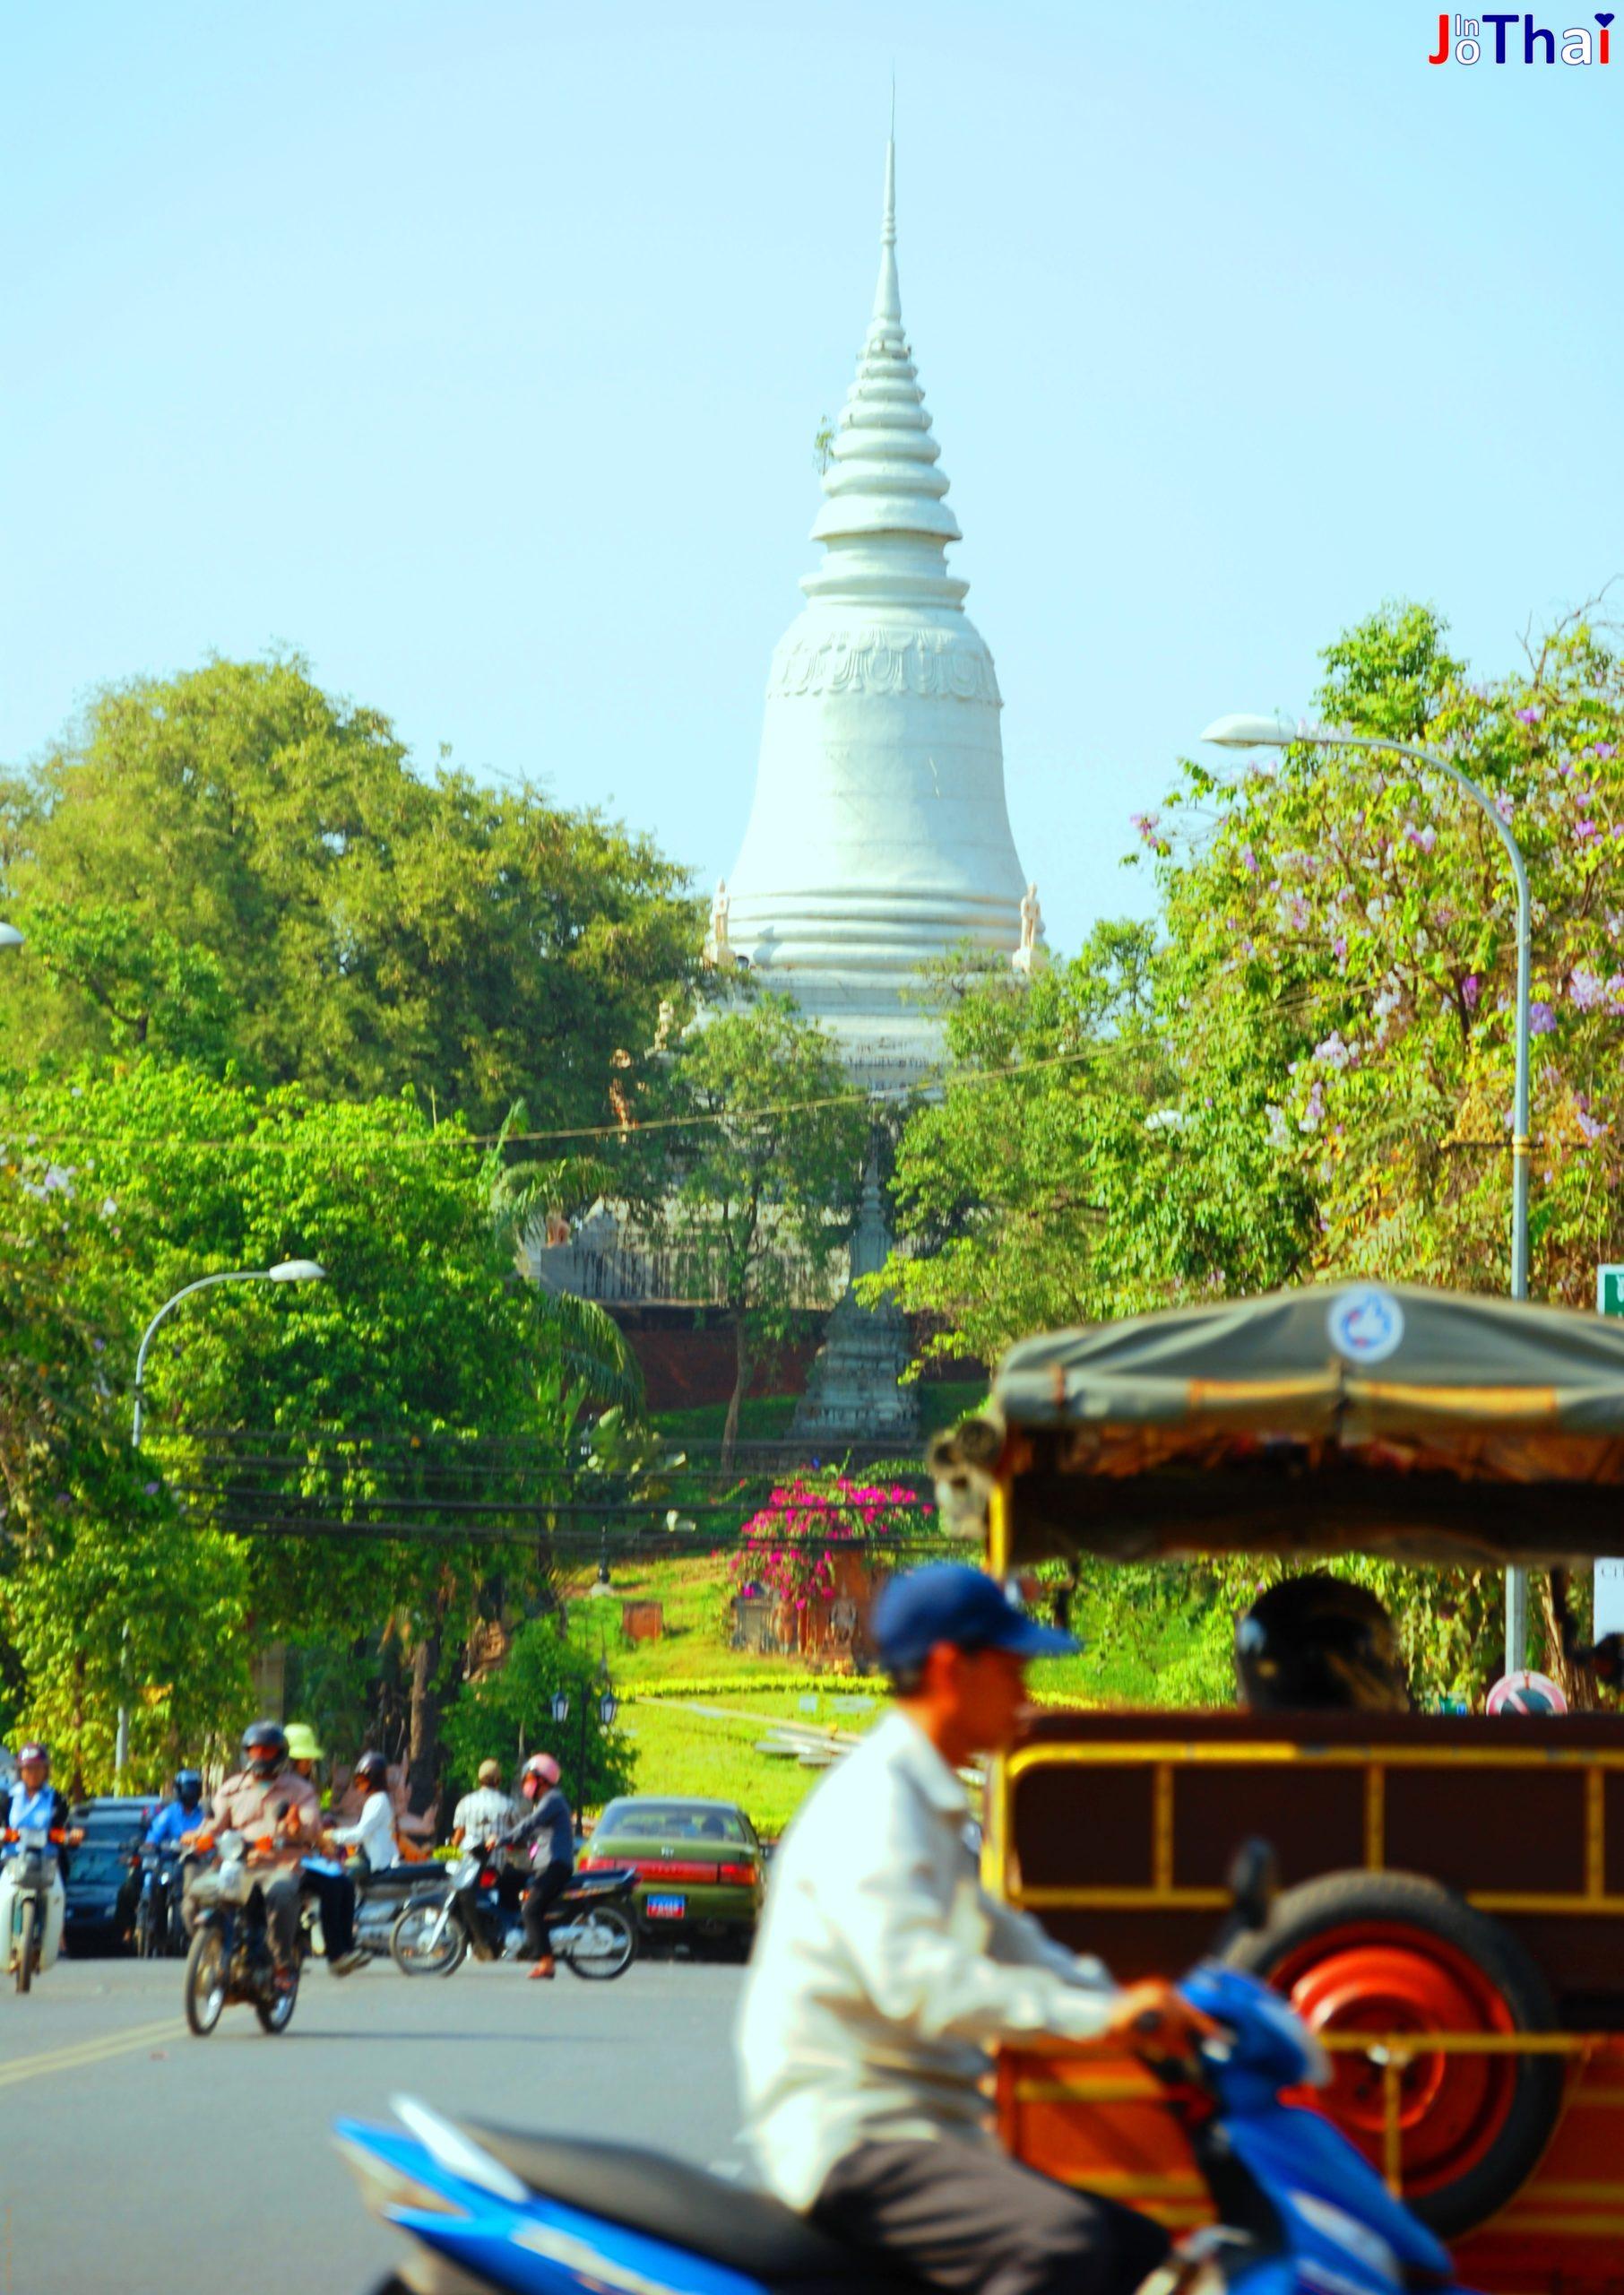 Auf dem Weg zum Wat Phnom in Phnom Penh - Cambodia